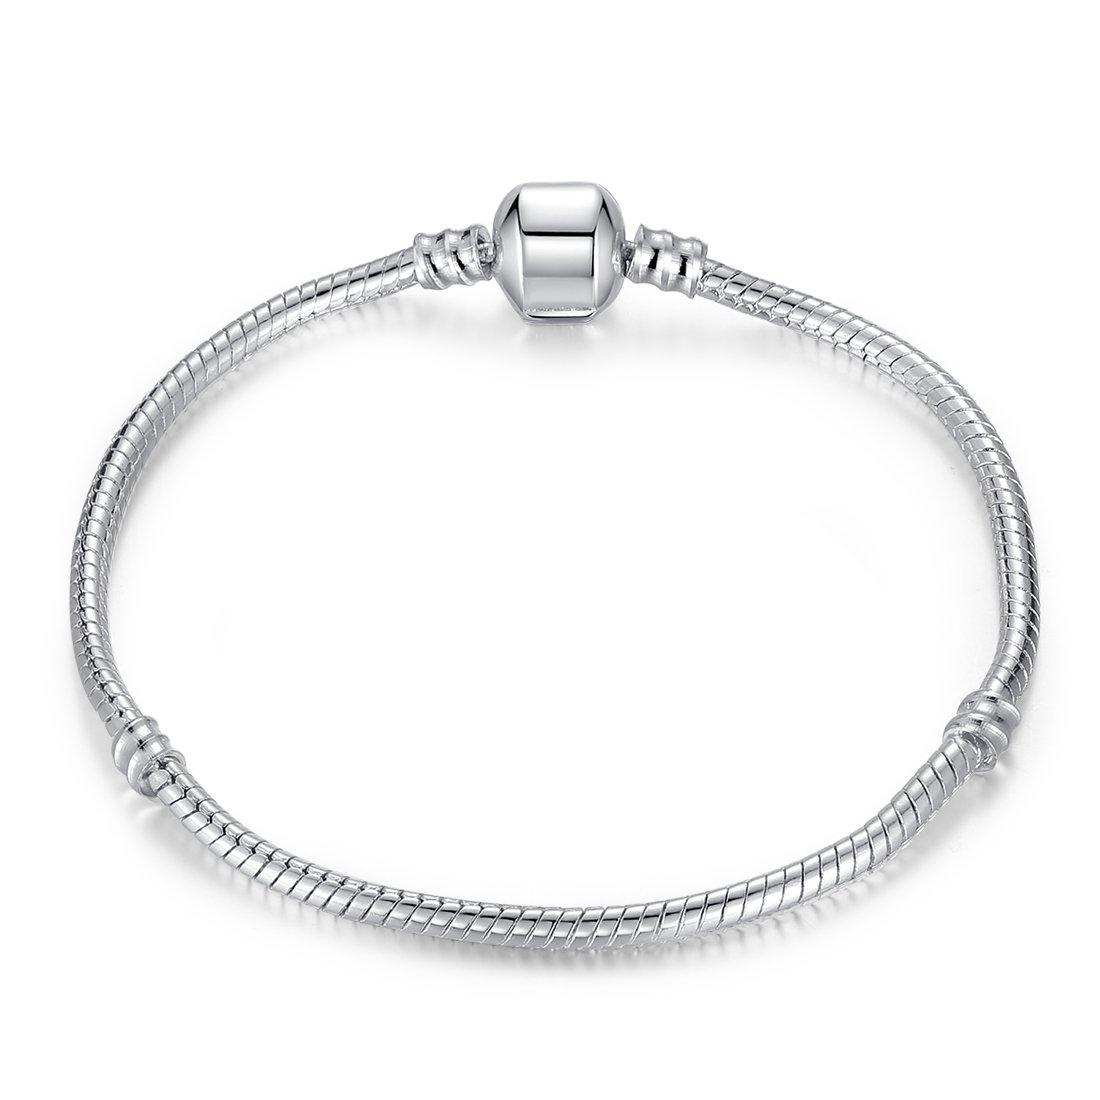 Presentski Fashion Silver Plated Snake Chain For Charm Bracelet B01N13M15G_US